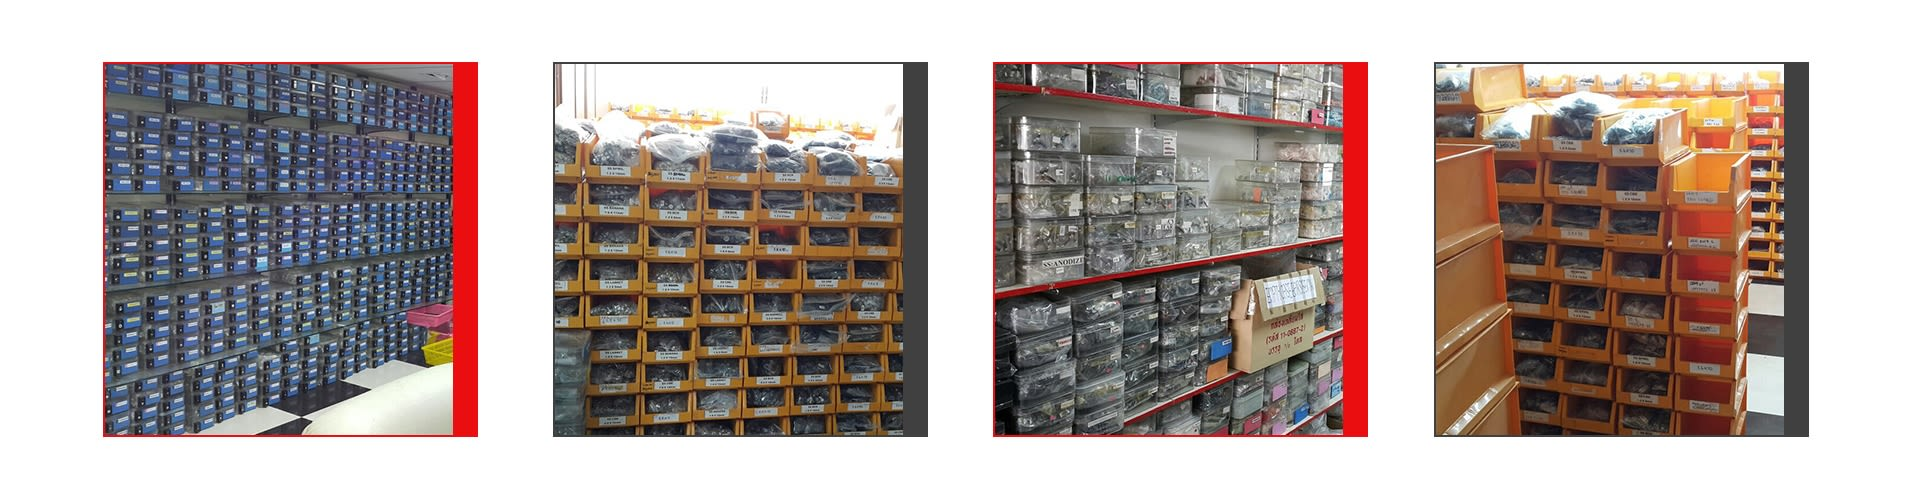 pb storage